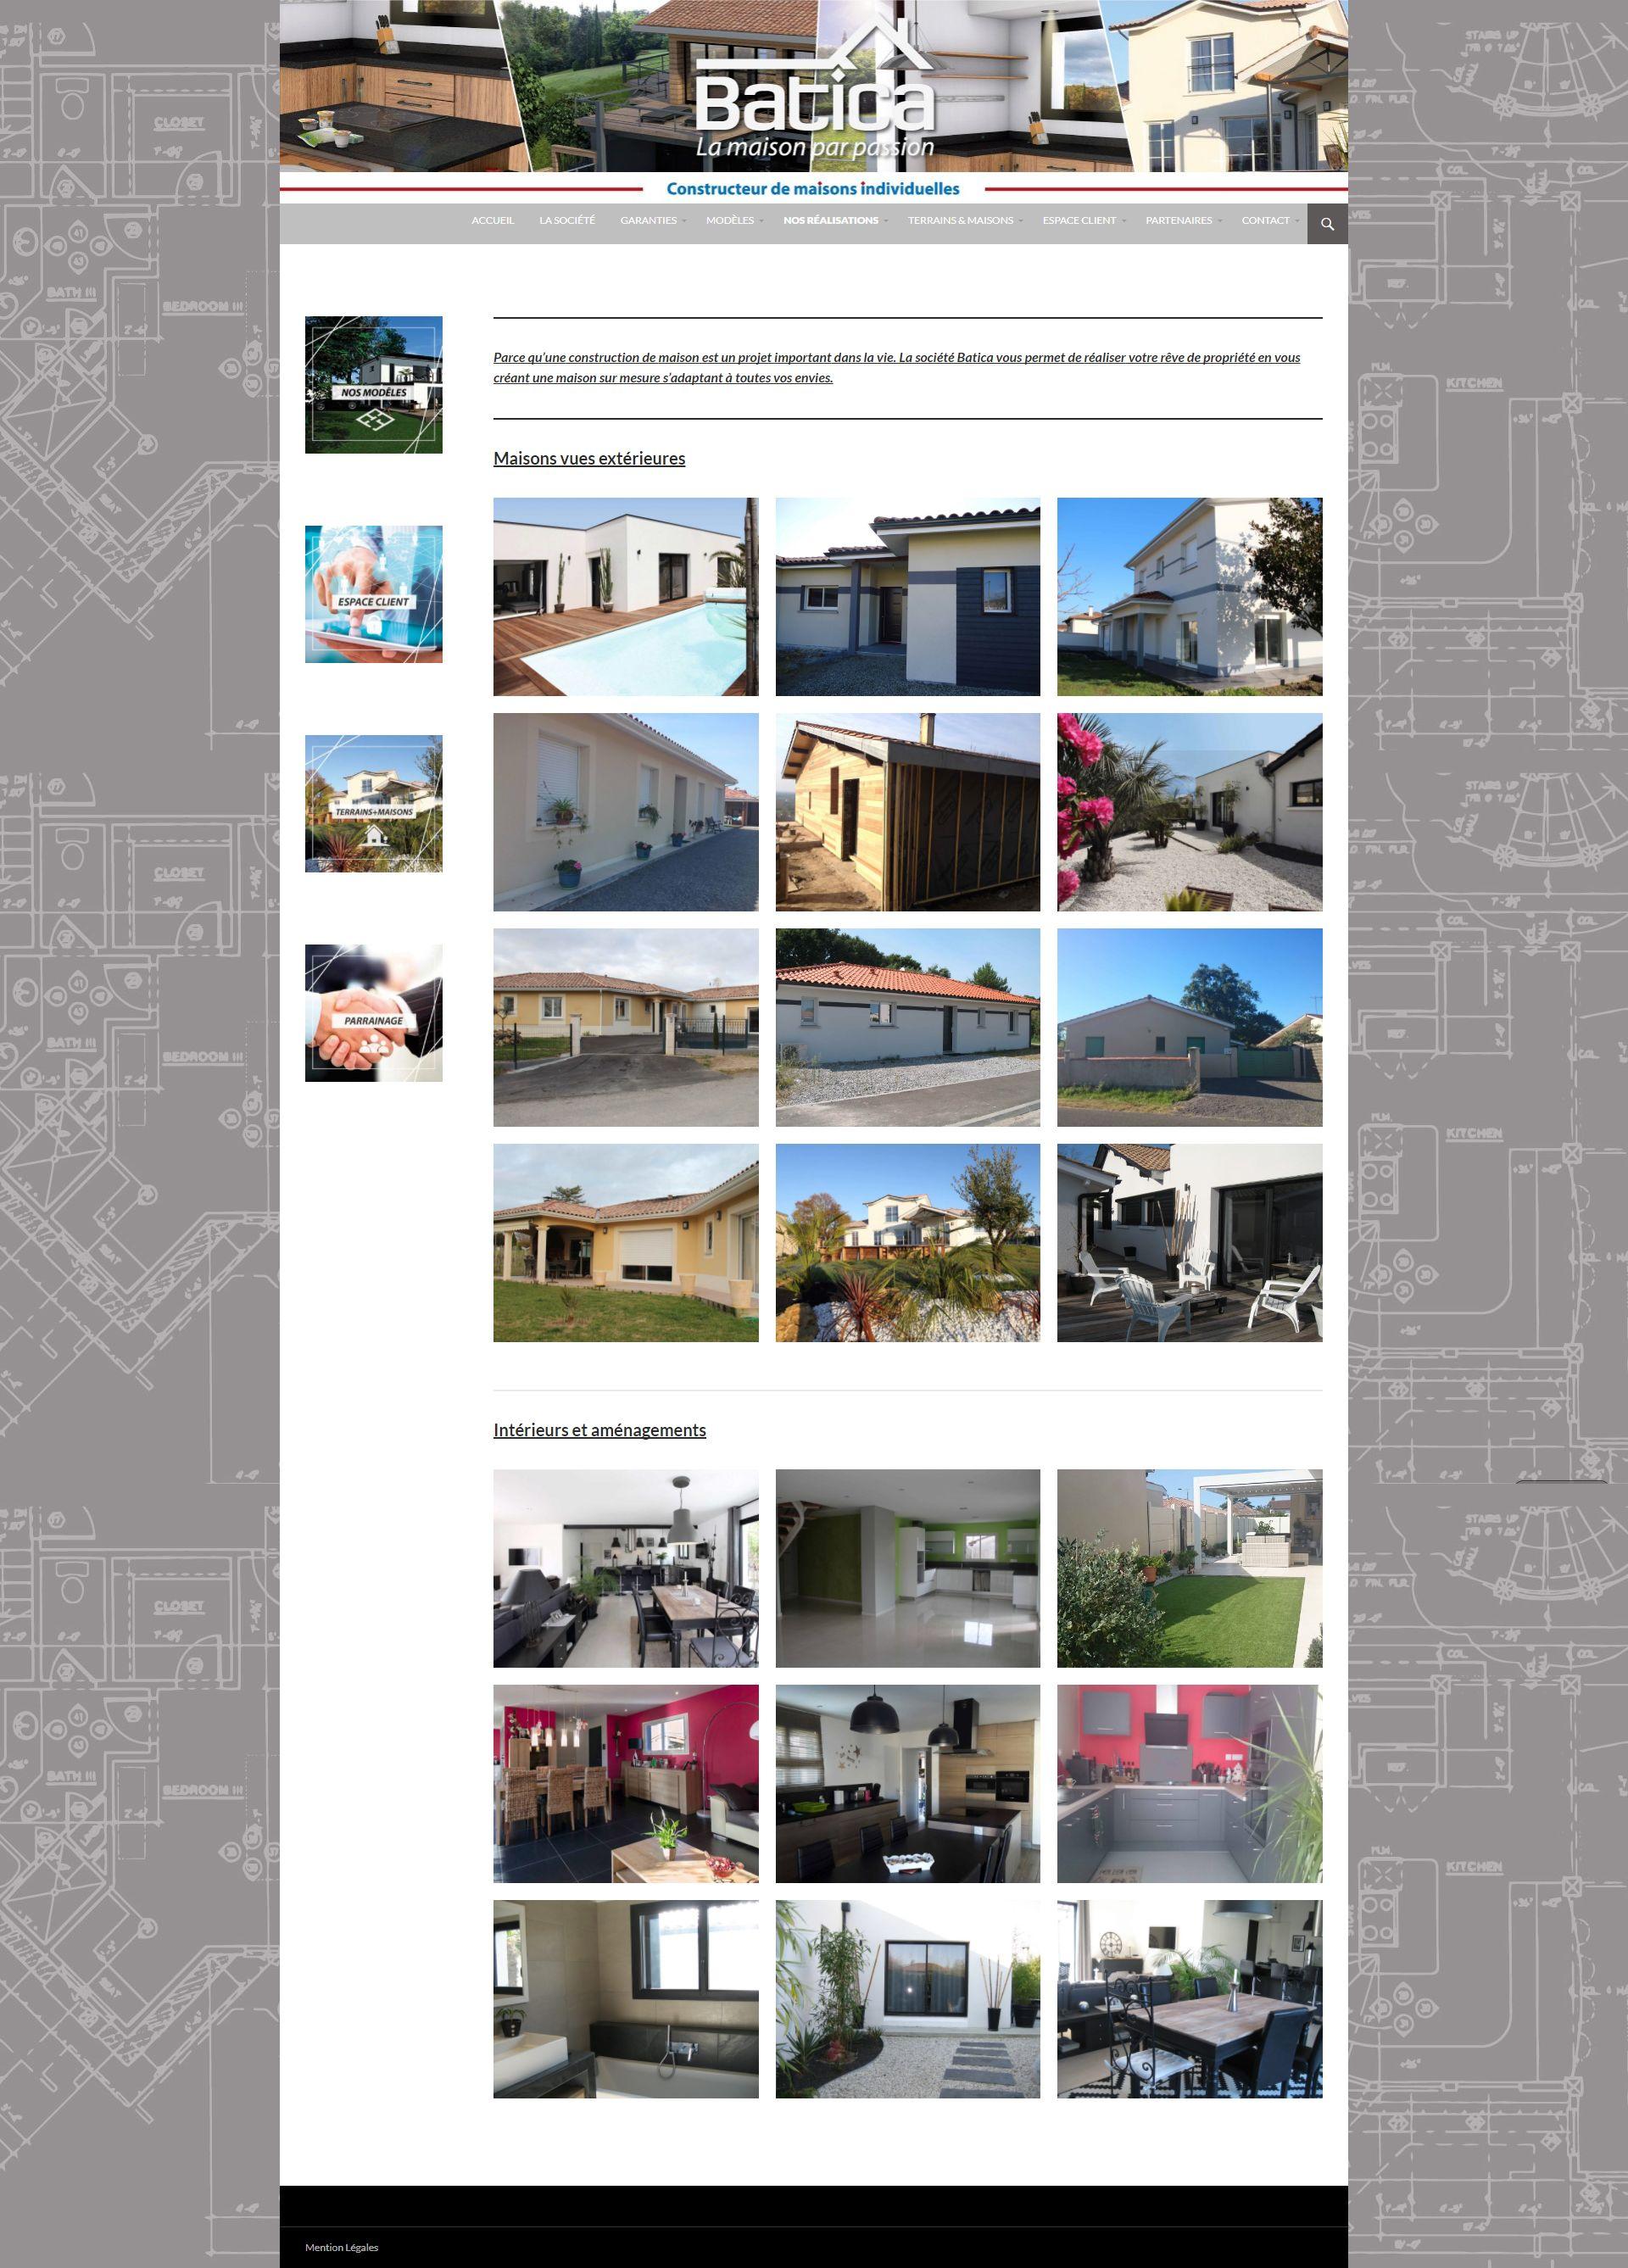 FireShot Pro Screen Capture #006 - 'nos réalisations I BATICA I Constructeur de maisons individuelles' - www_batica33_fr_nos-realisations